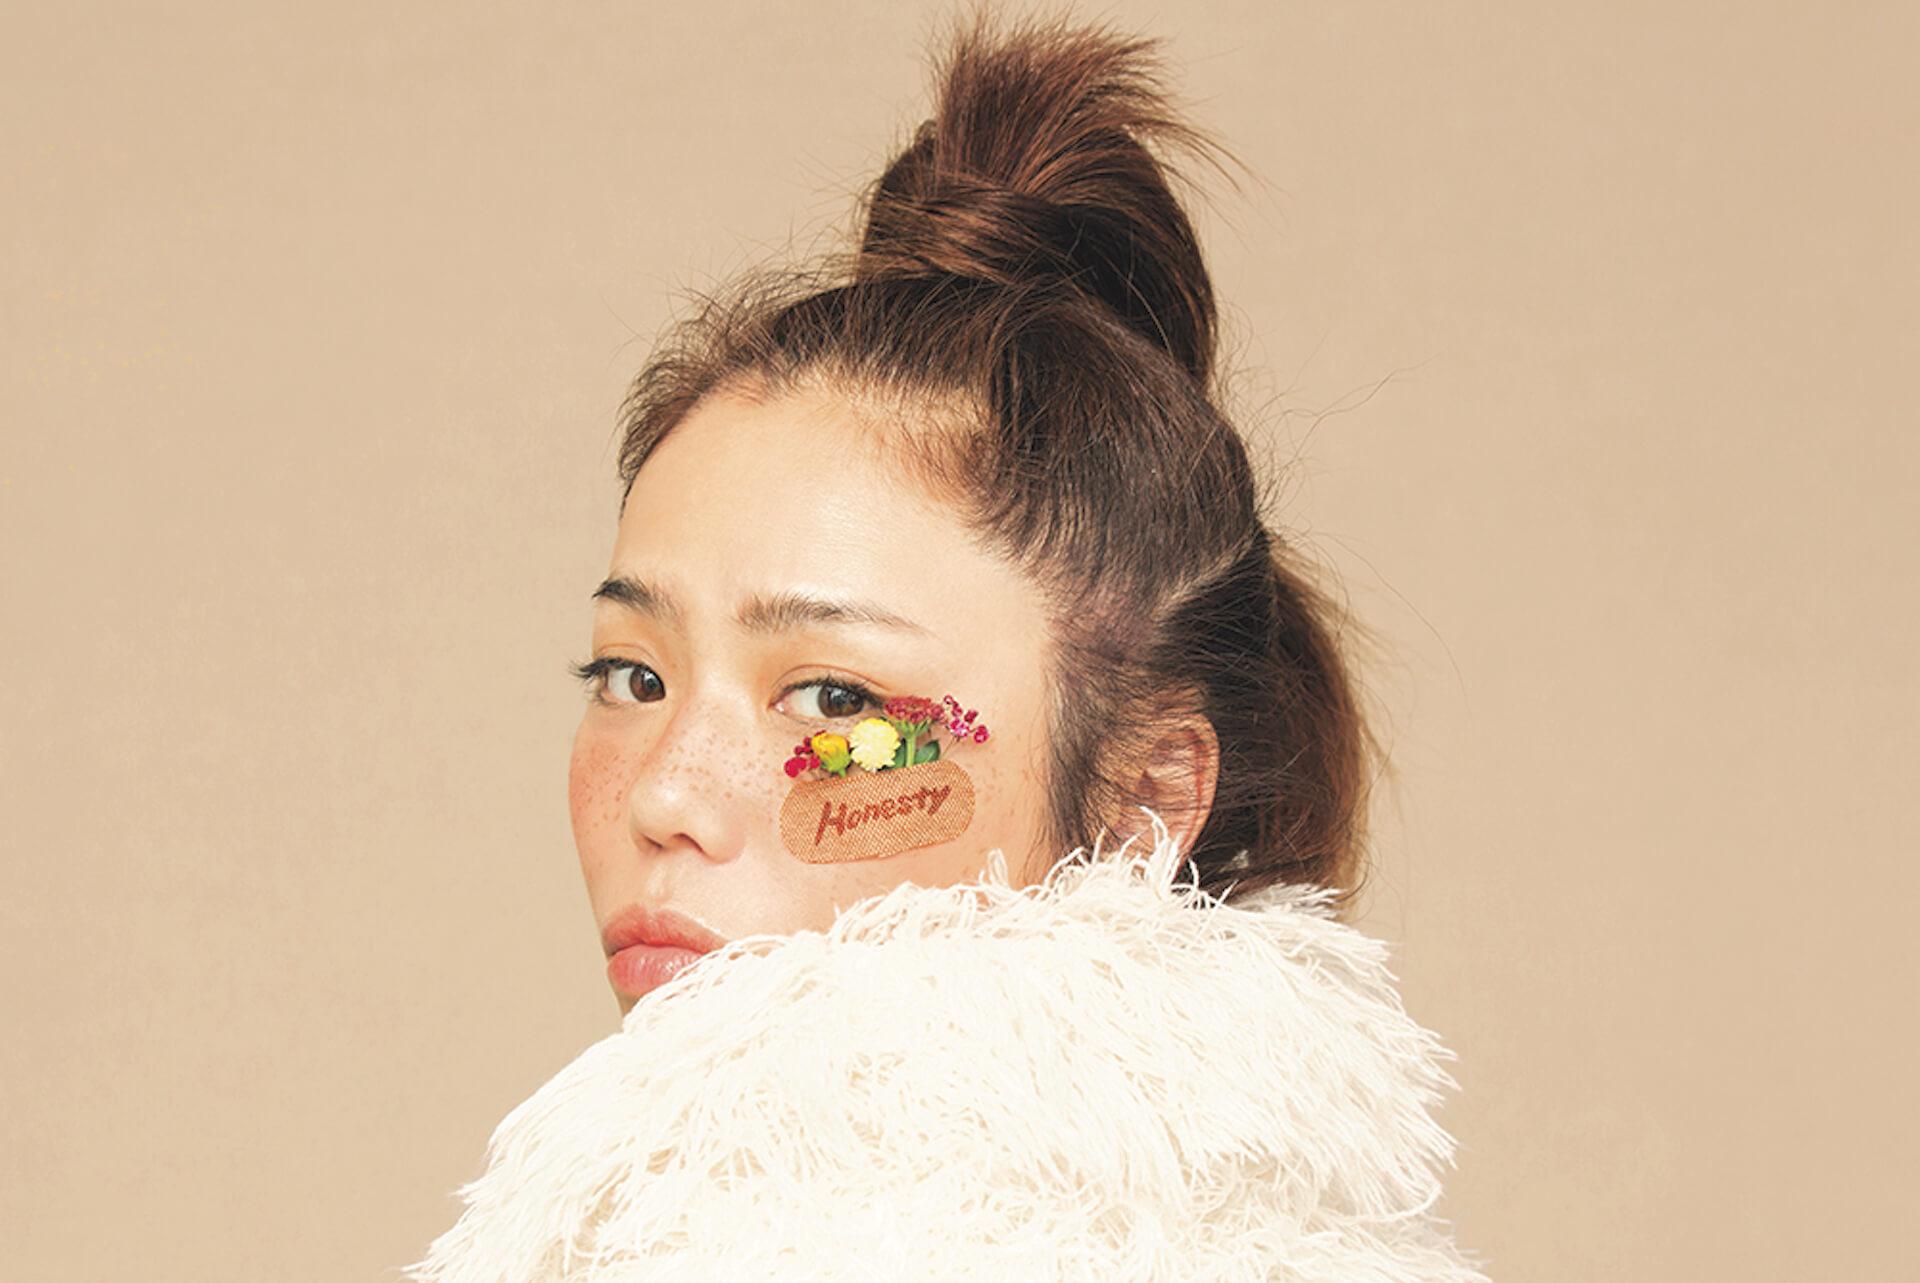 Chara+YUKIが20年の時を経てついに再始動!シングル&ミニアルバムが発売決定|東京・大阪ではライブも music191126_chara_yuki_3